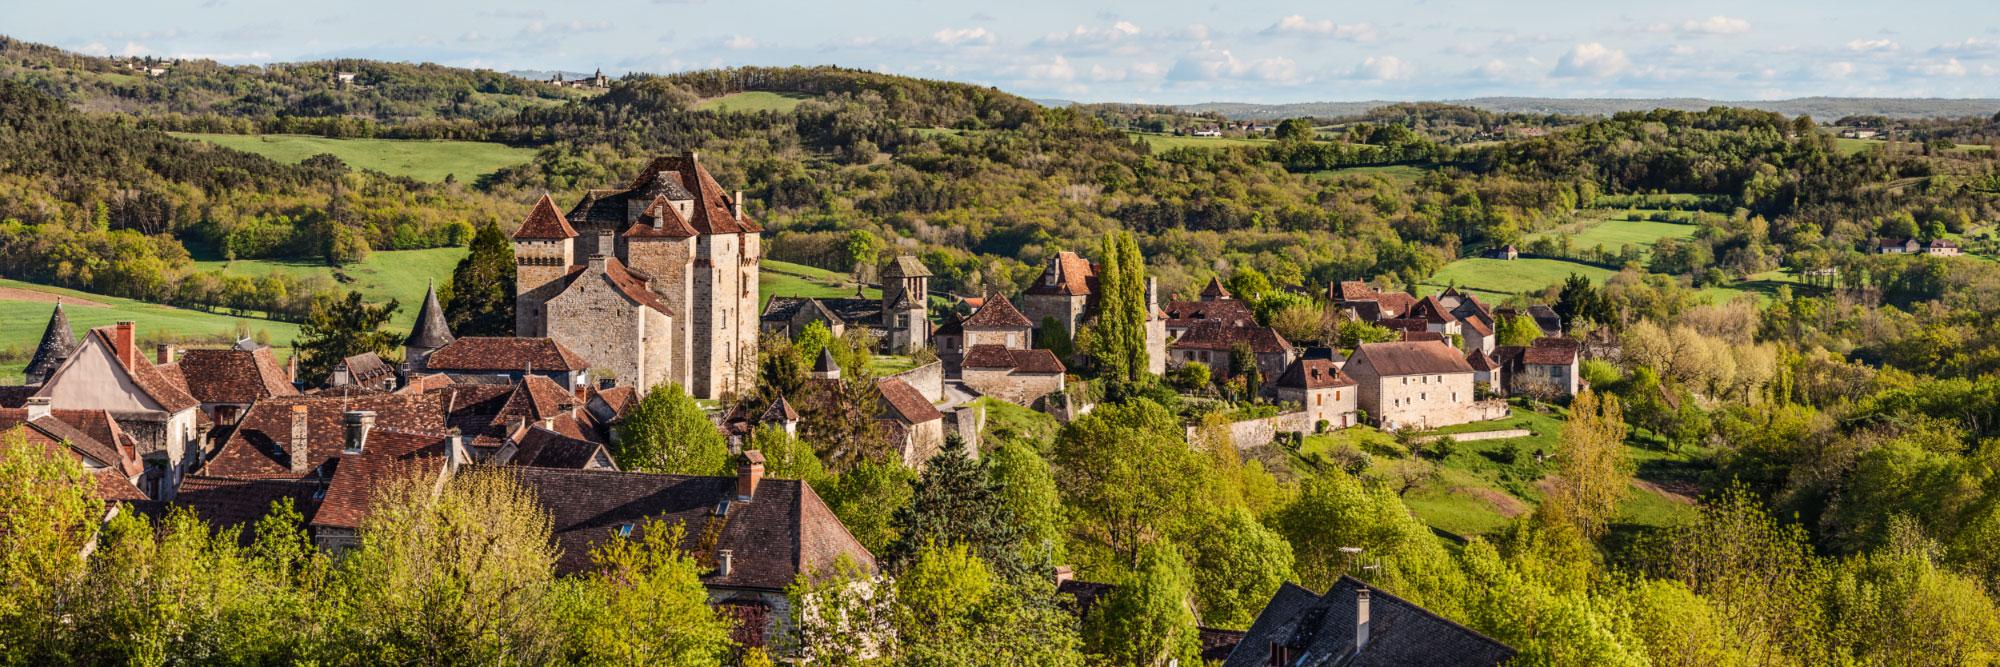 Curemonte, Limousin